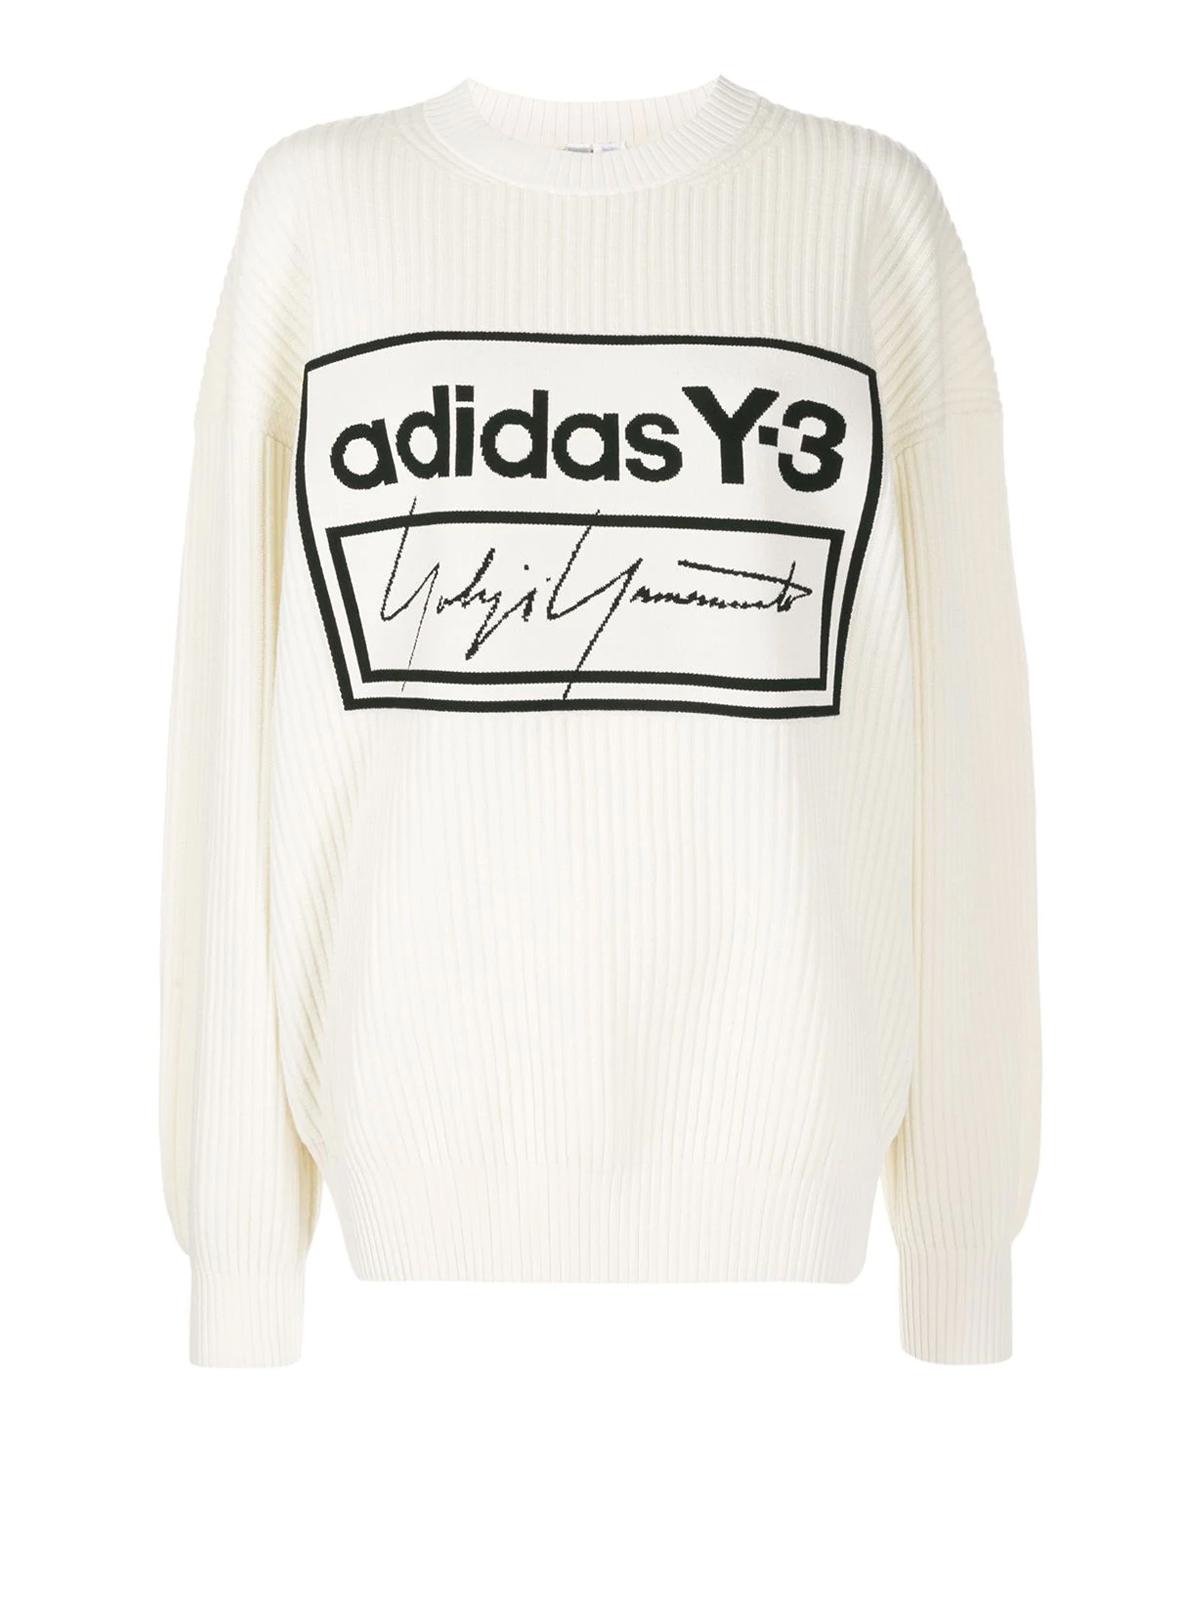 grieta Debilitar Expresamente  Adidas Y-3 - Jacquard logo wool blend sweater - یقه گرد - FJ0375